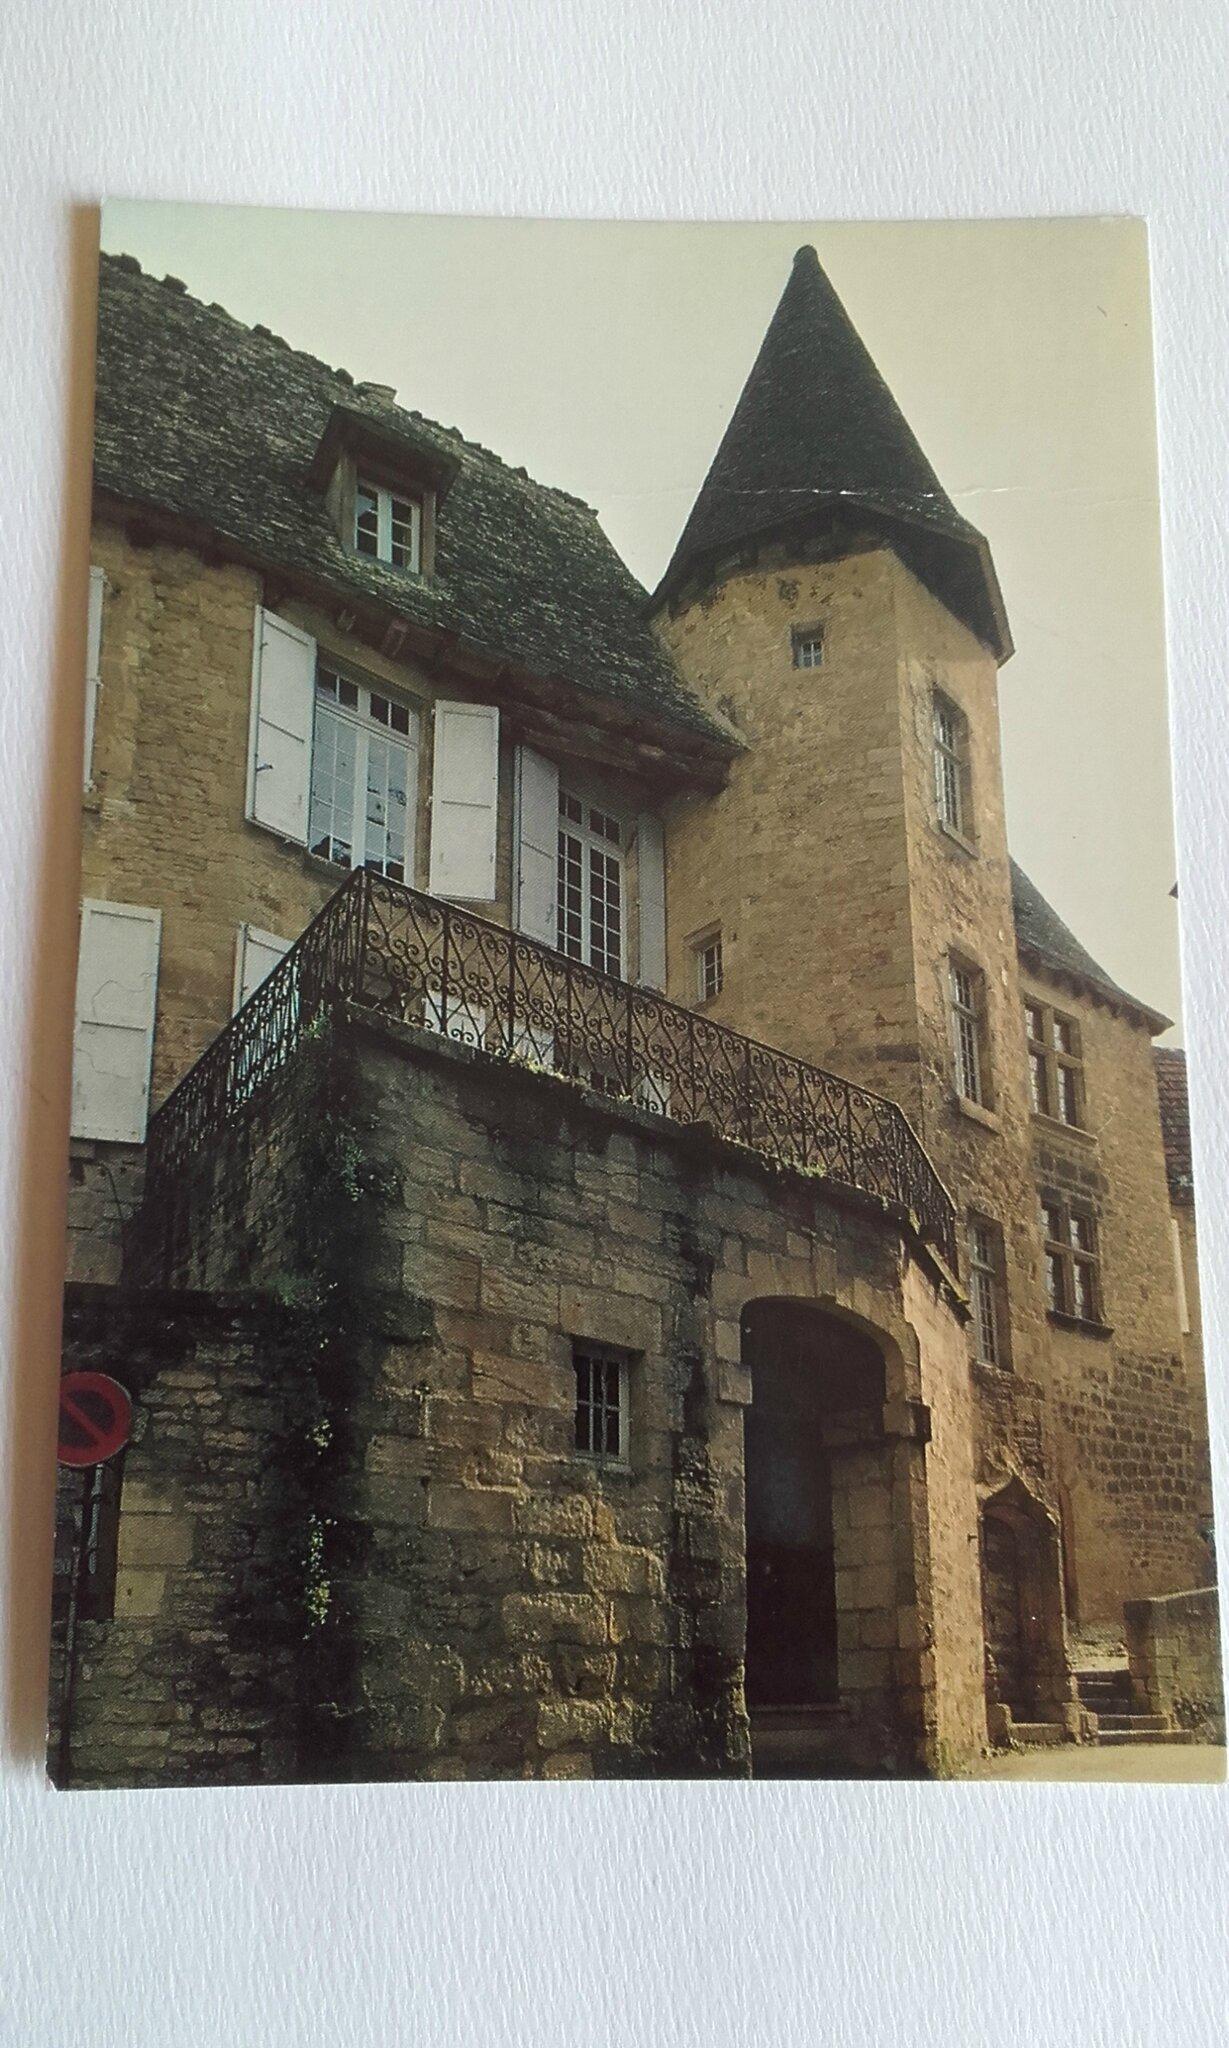 Sarlat hotel de Gisson ou maison Chassaing datée 1985